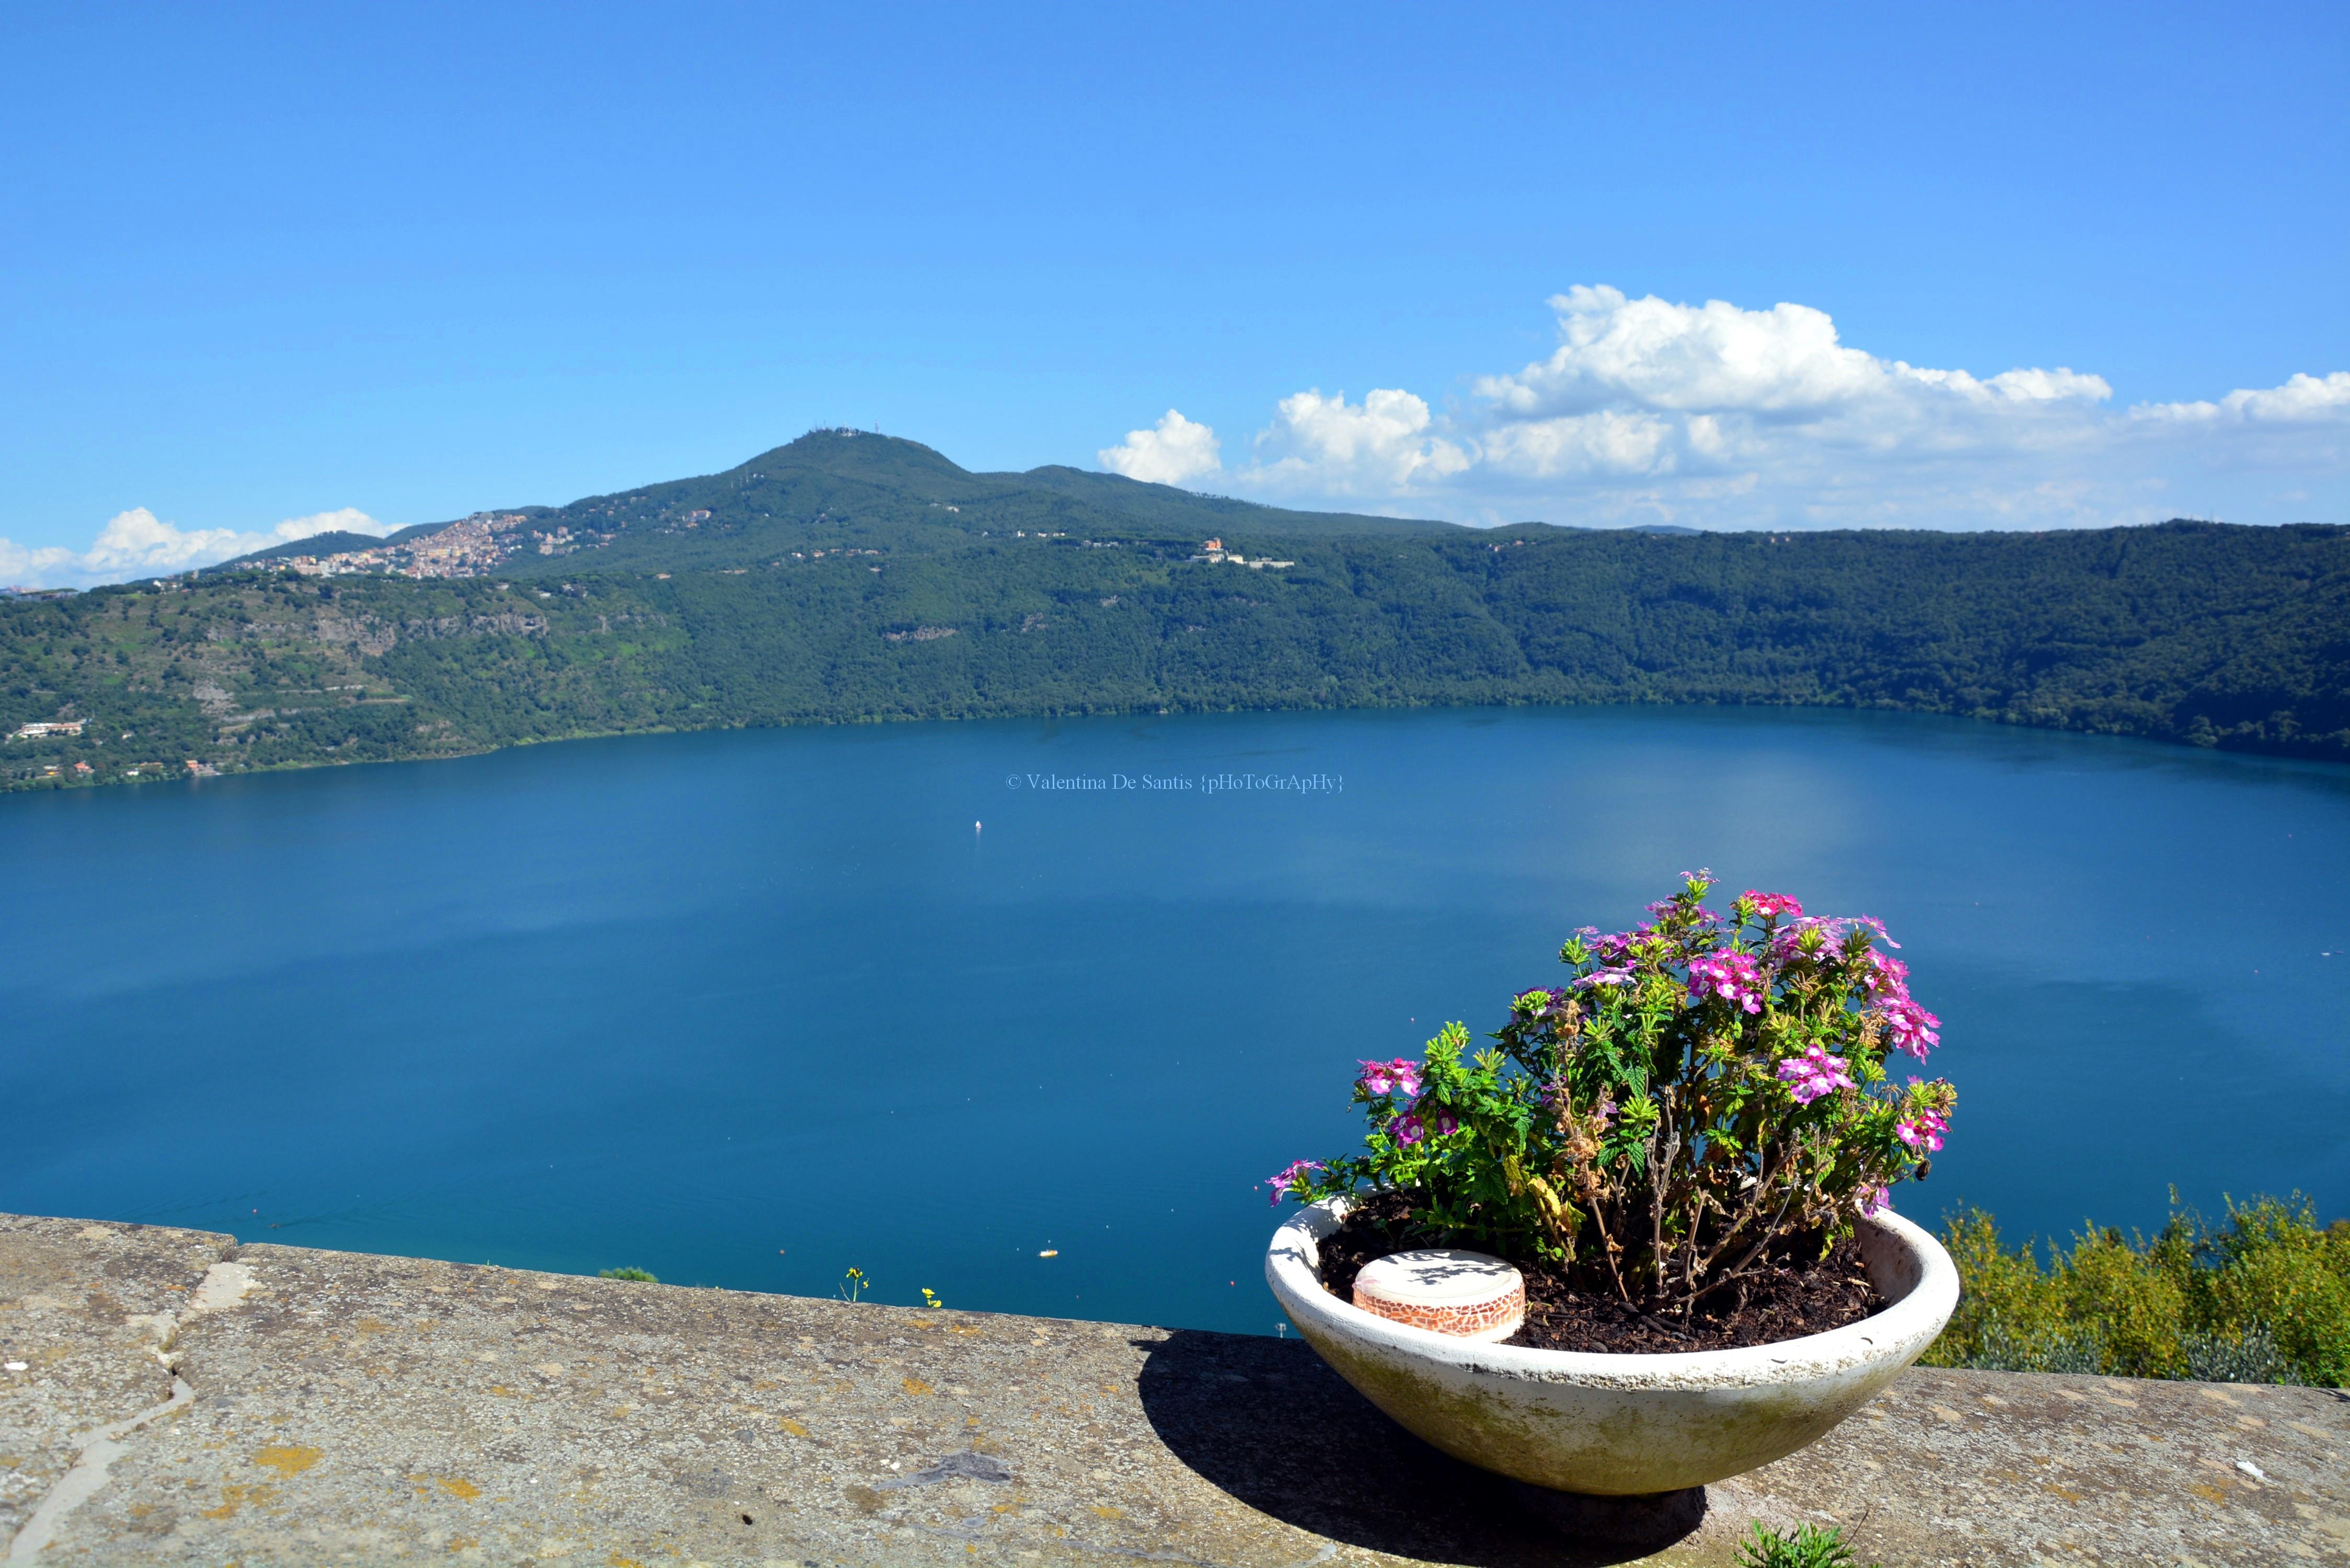 View of Lake Albano